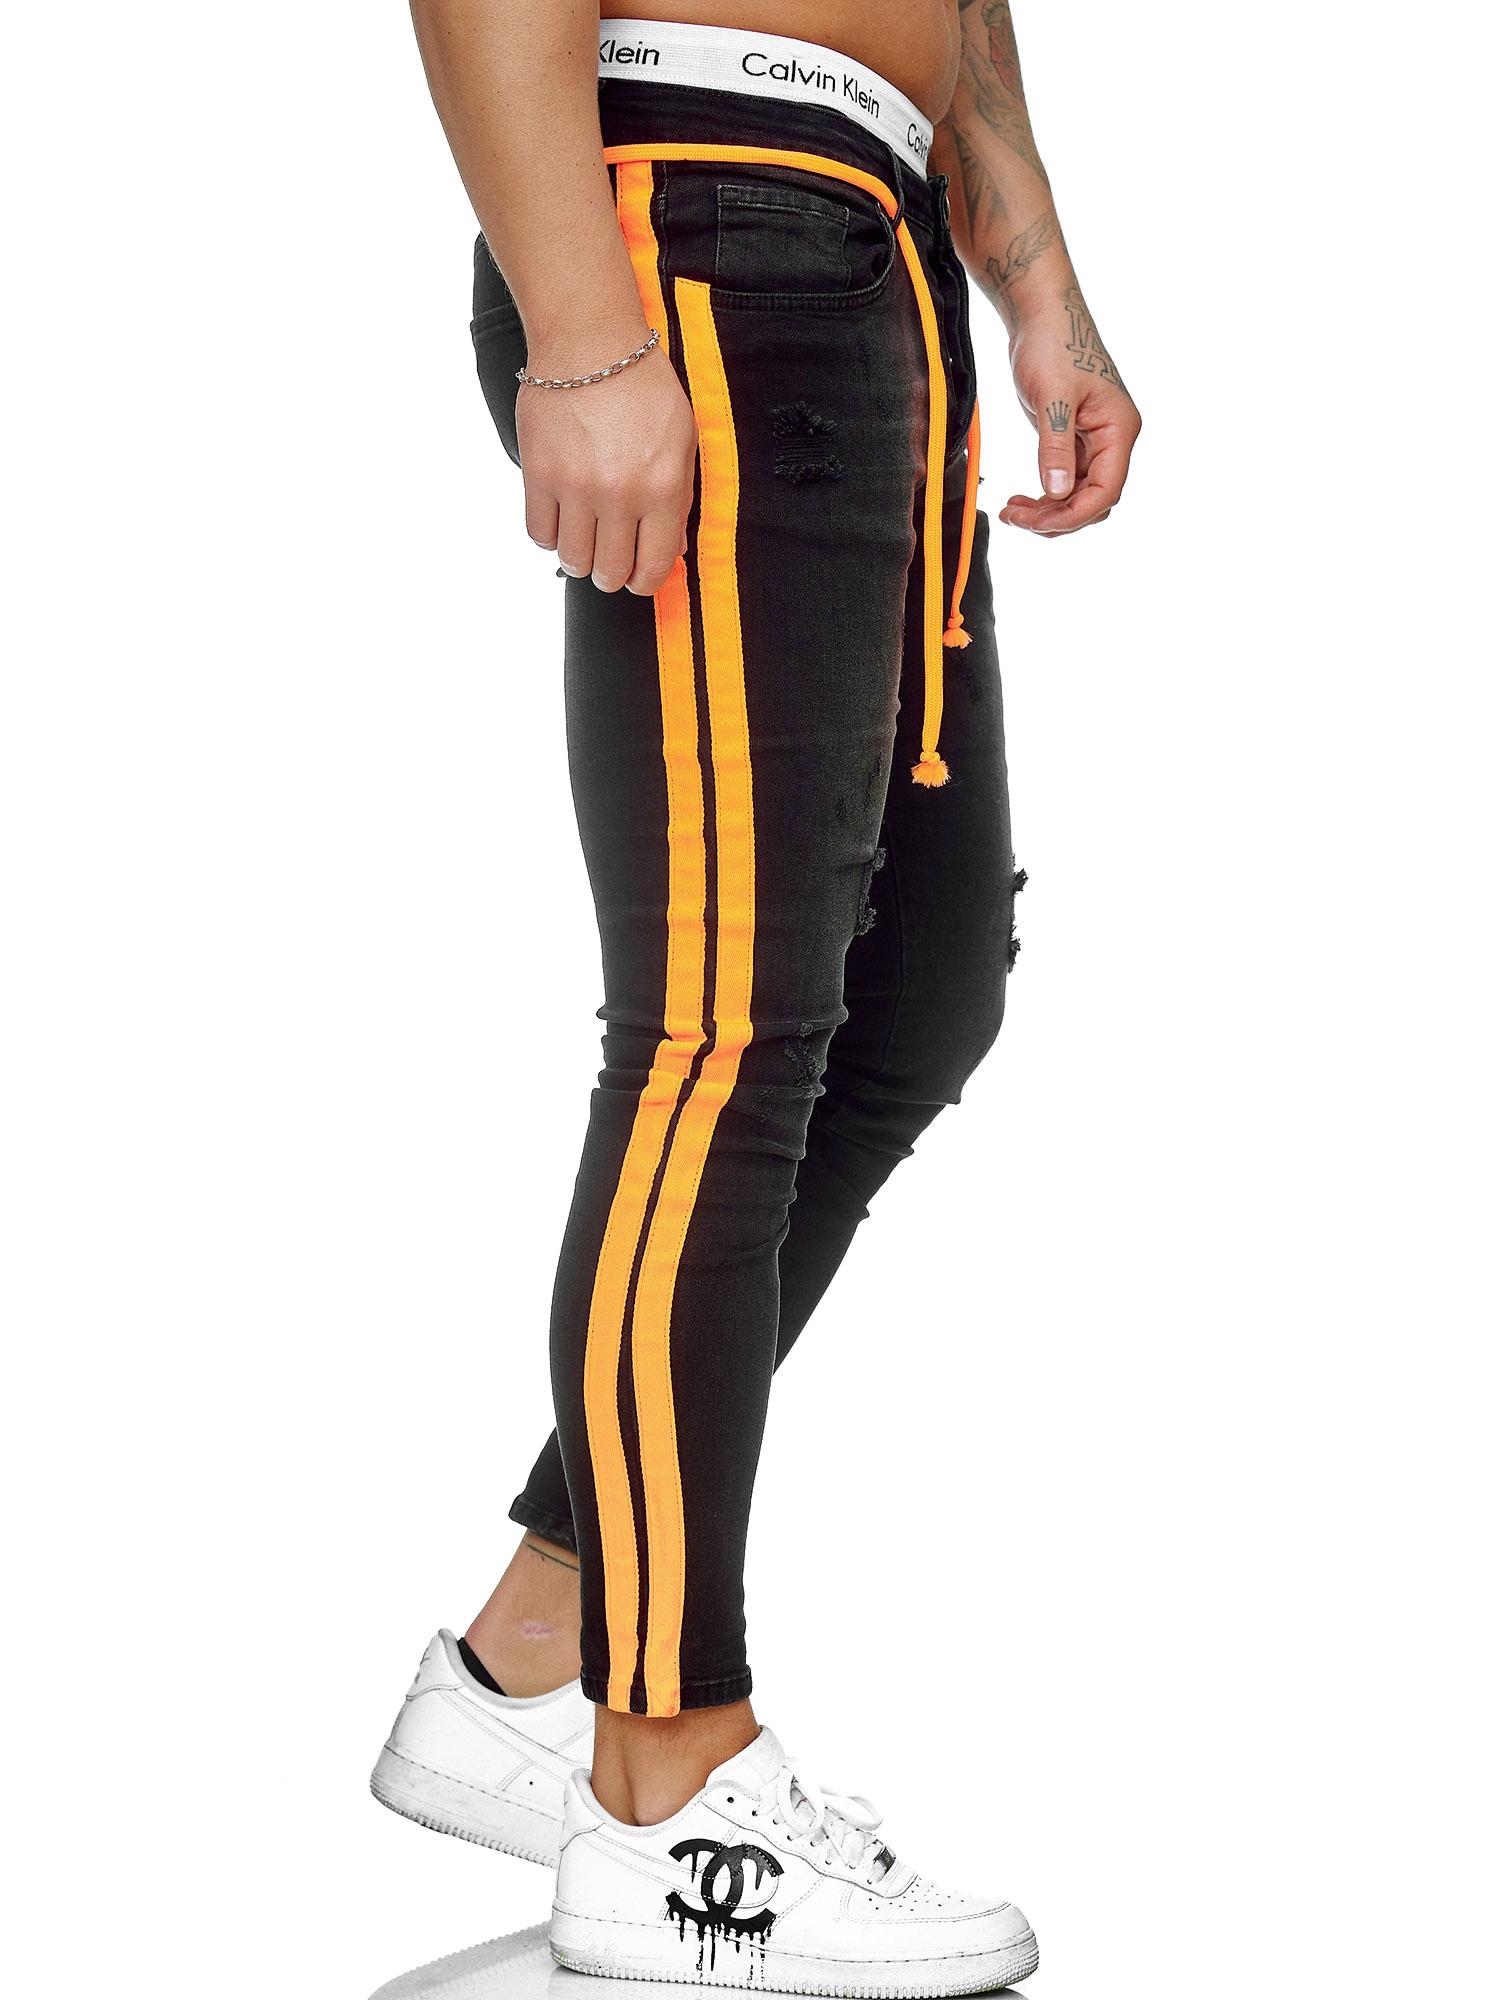 Hommes Jeans Pantalon Slim Fit Hommes Skinny Denim Jeans CREATEUR 5118 C